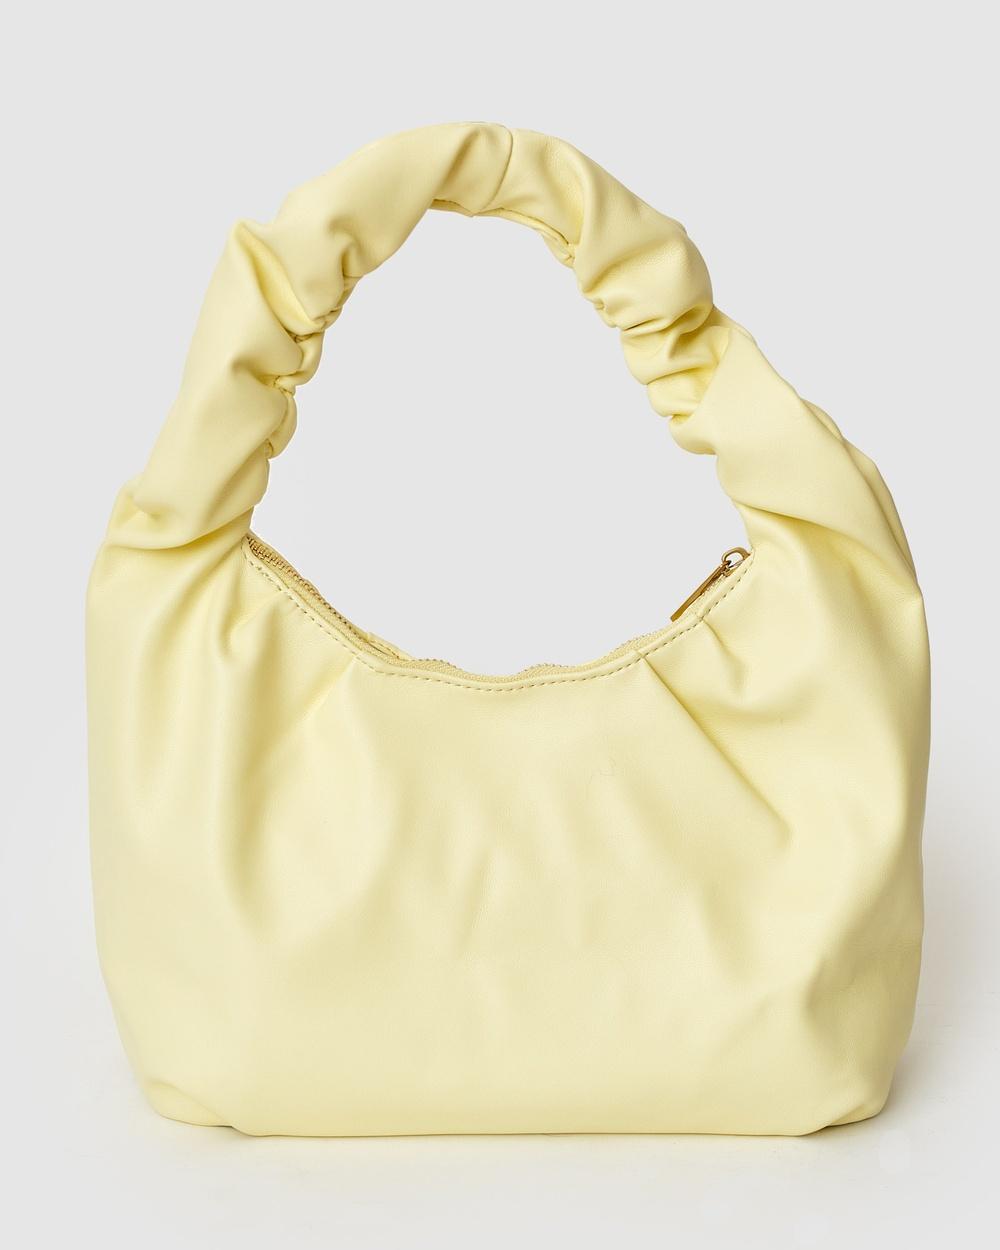 Brie Leon Fae Bag Handbags Yellow Australia